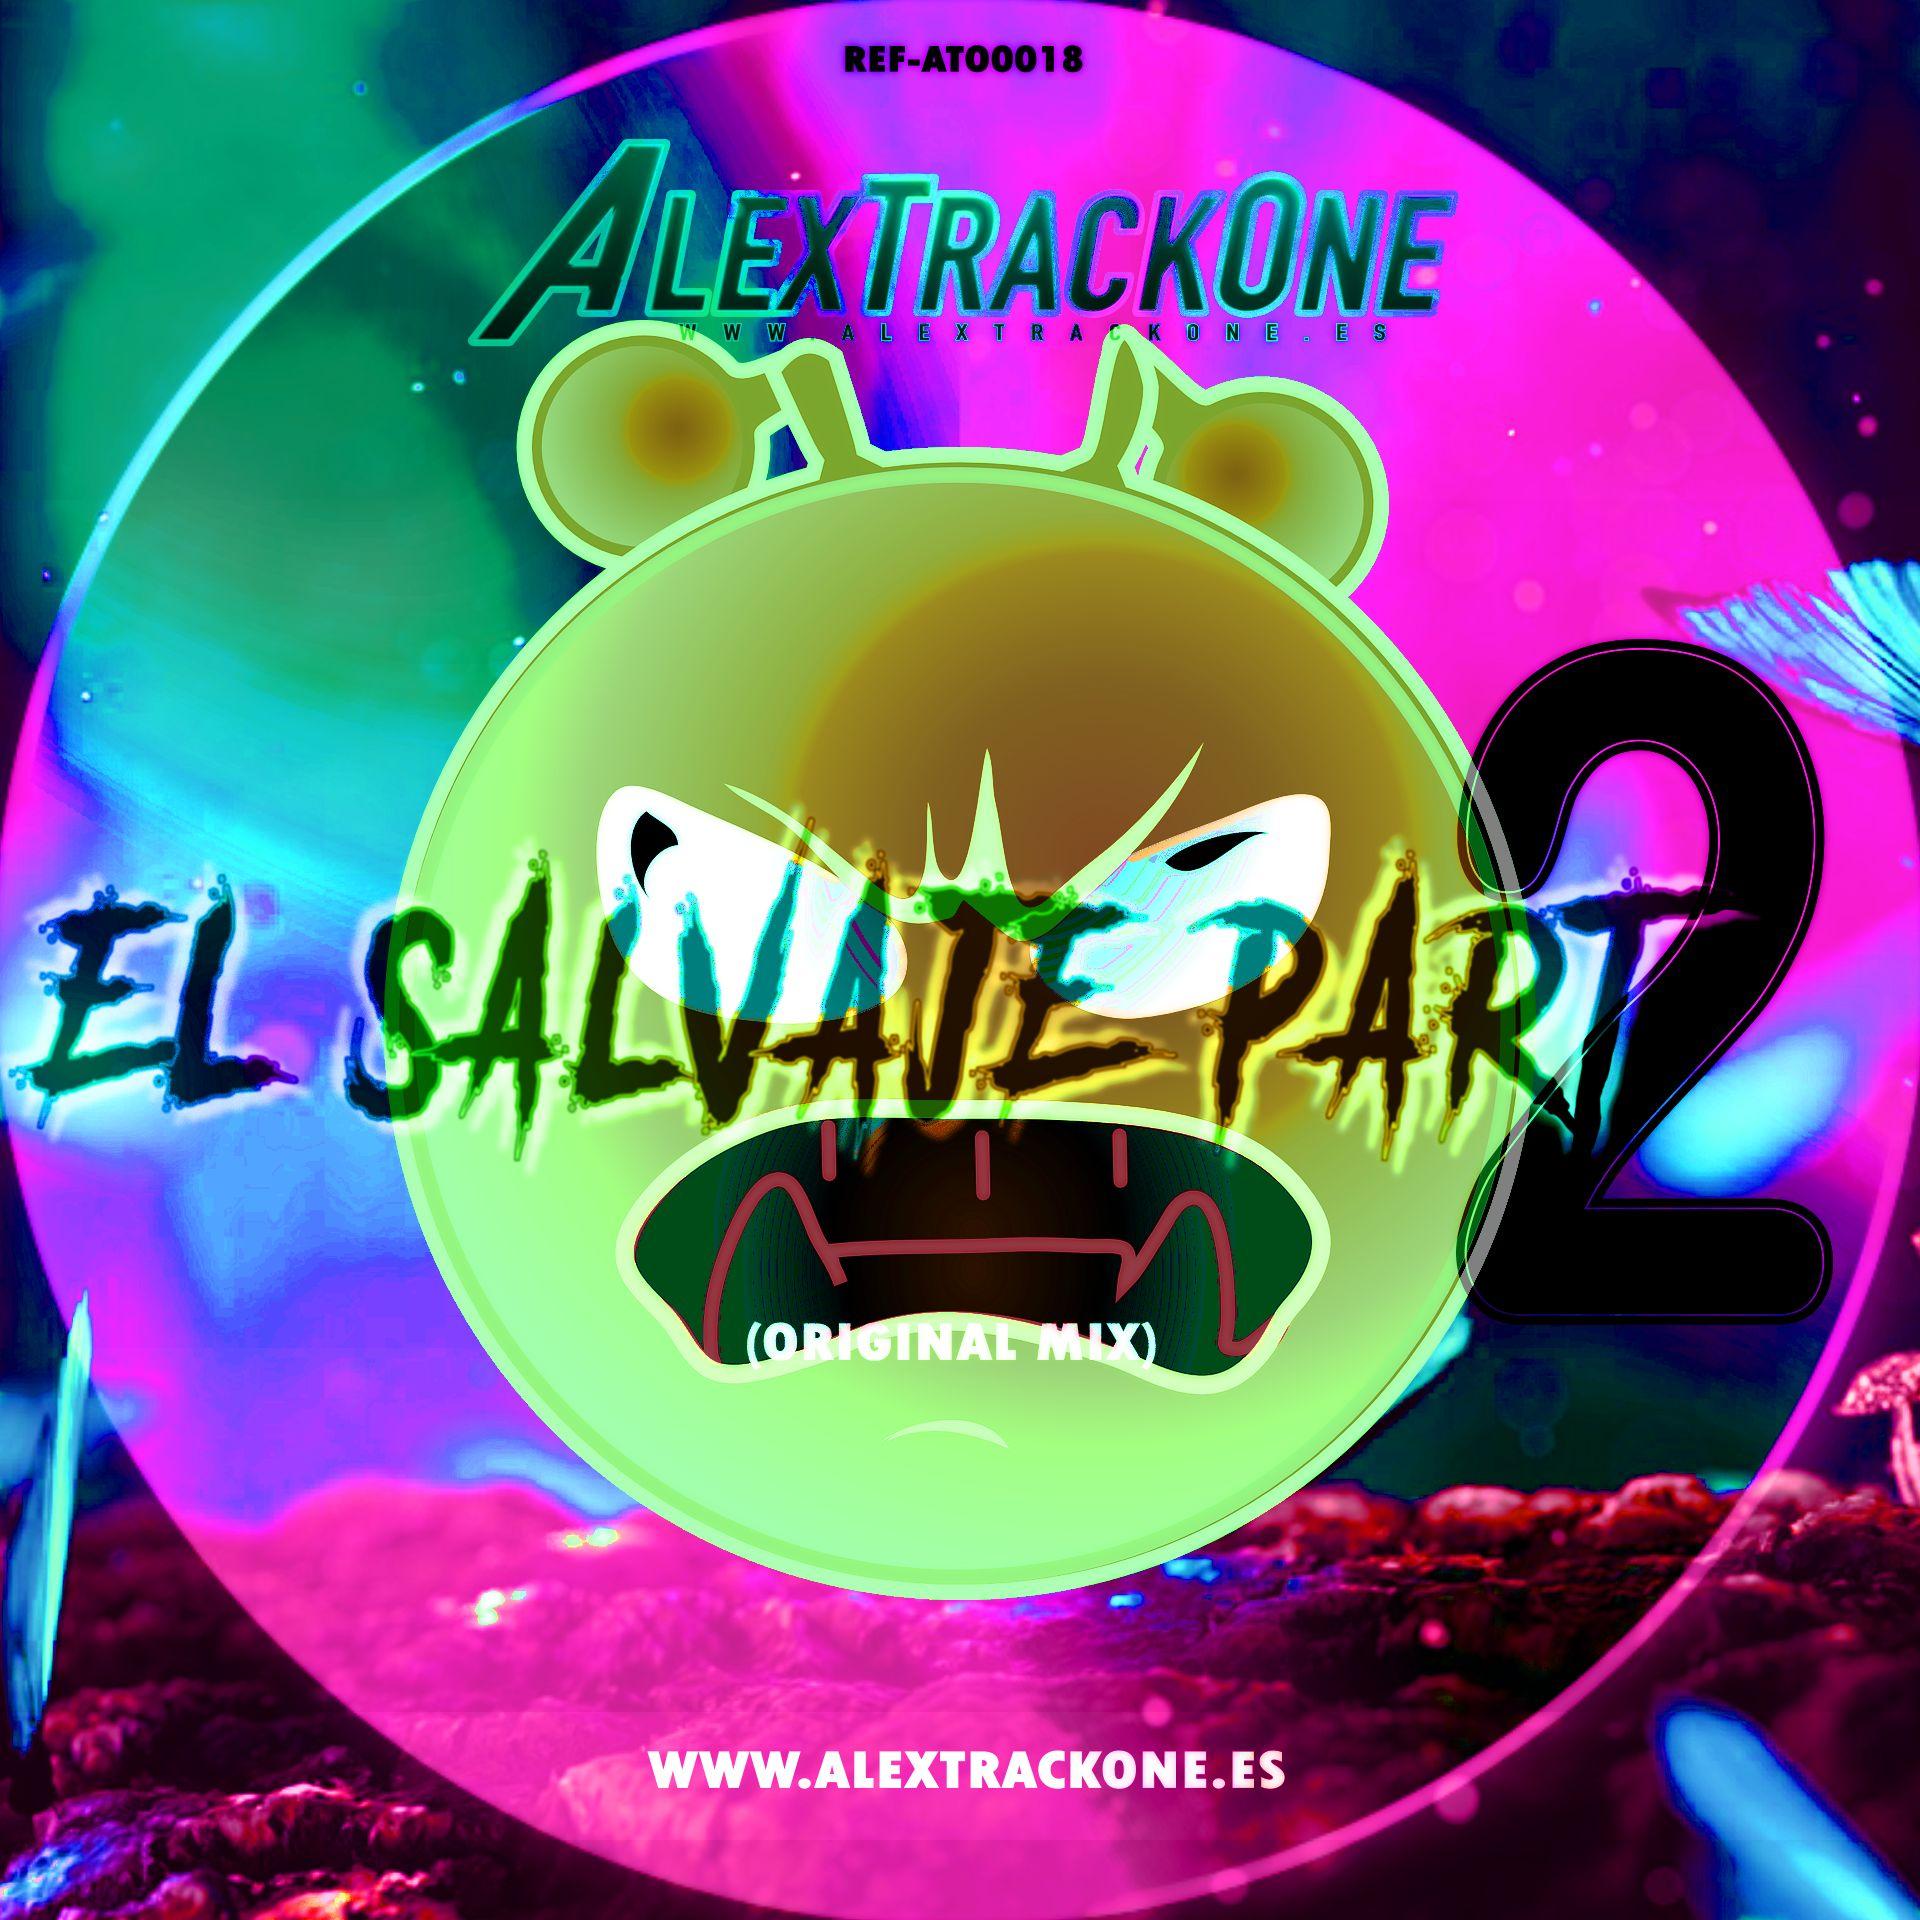 REF-ATO0018 EL SALVAJE PART 2 (ORIGINAL MIX) (MP3 & WAV)